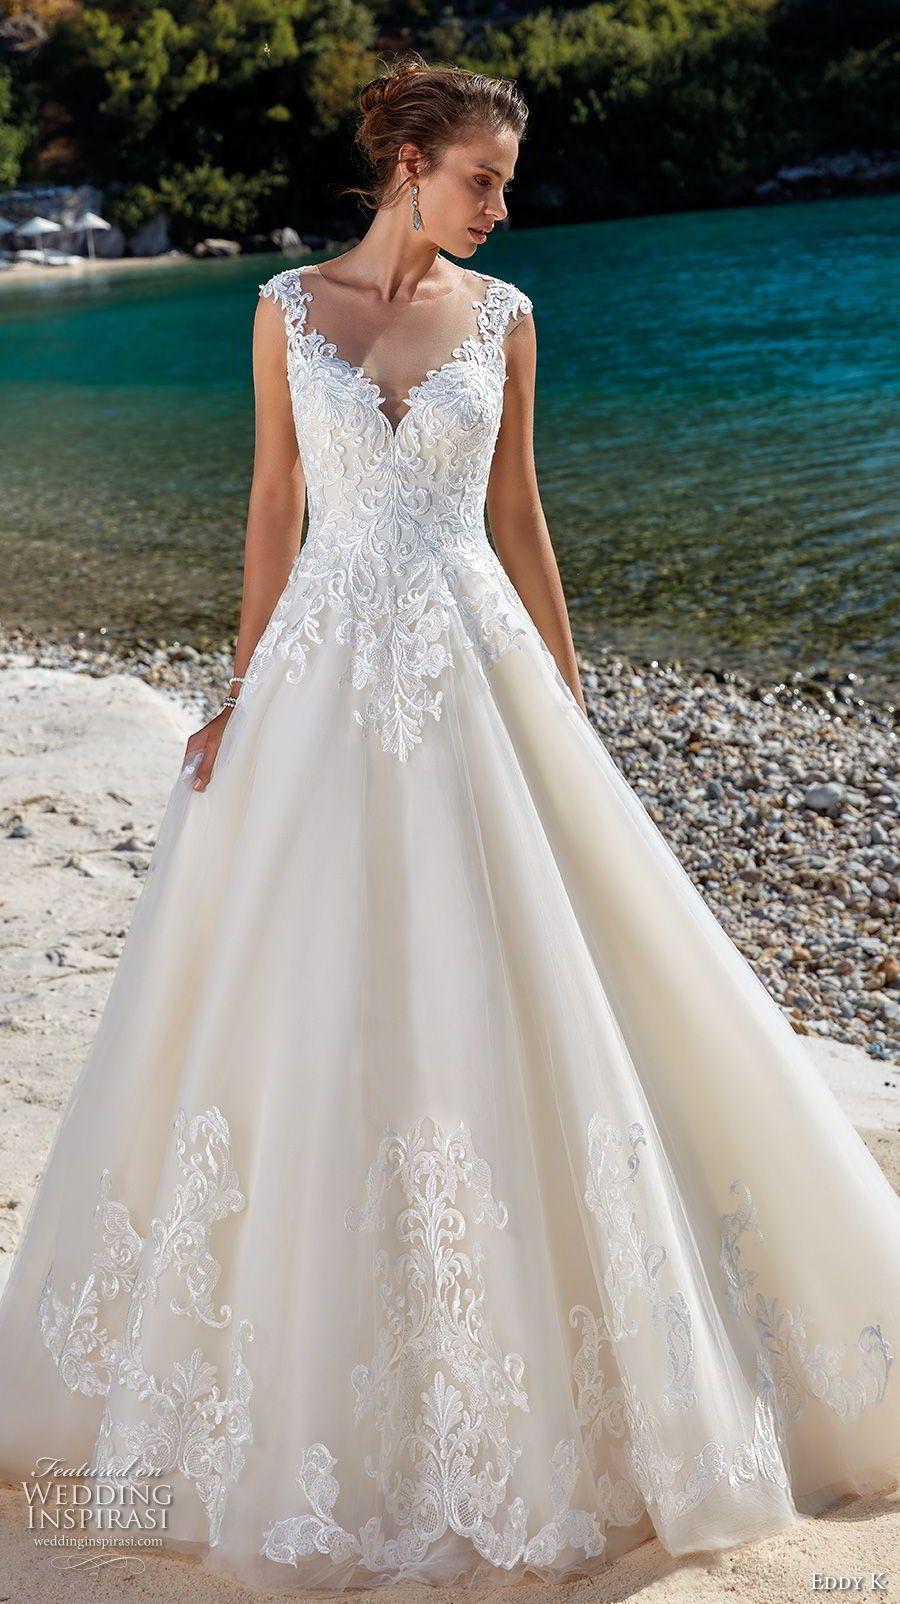 Eddy k bridal cap sleeves illusion jewel sweetheart neckline